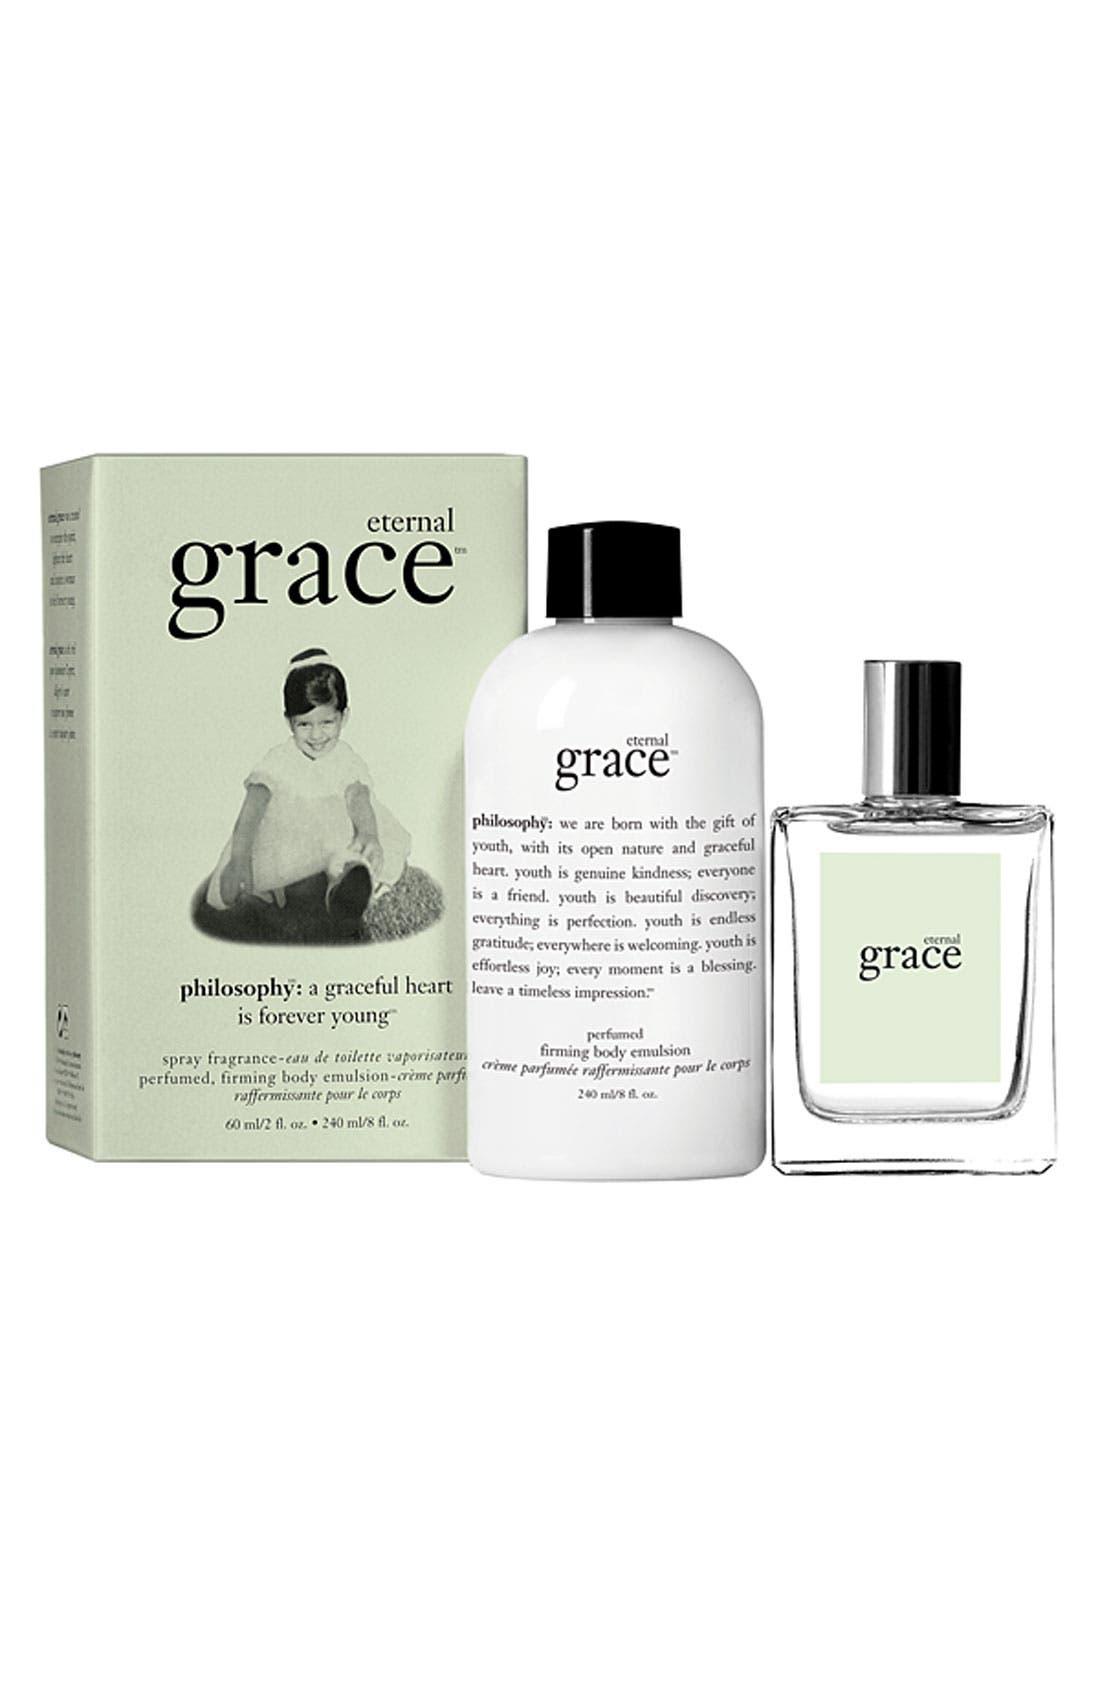 Alternate Image 1 Selected - philosophy 'eternal grace' spray fragrance & firming body emulsion ($62 Value)